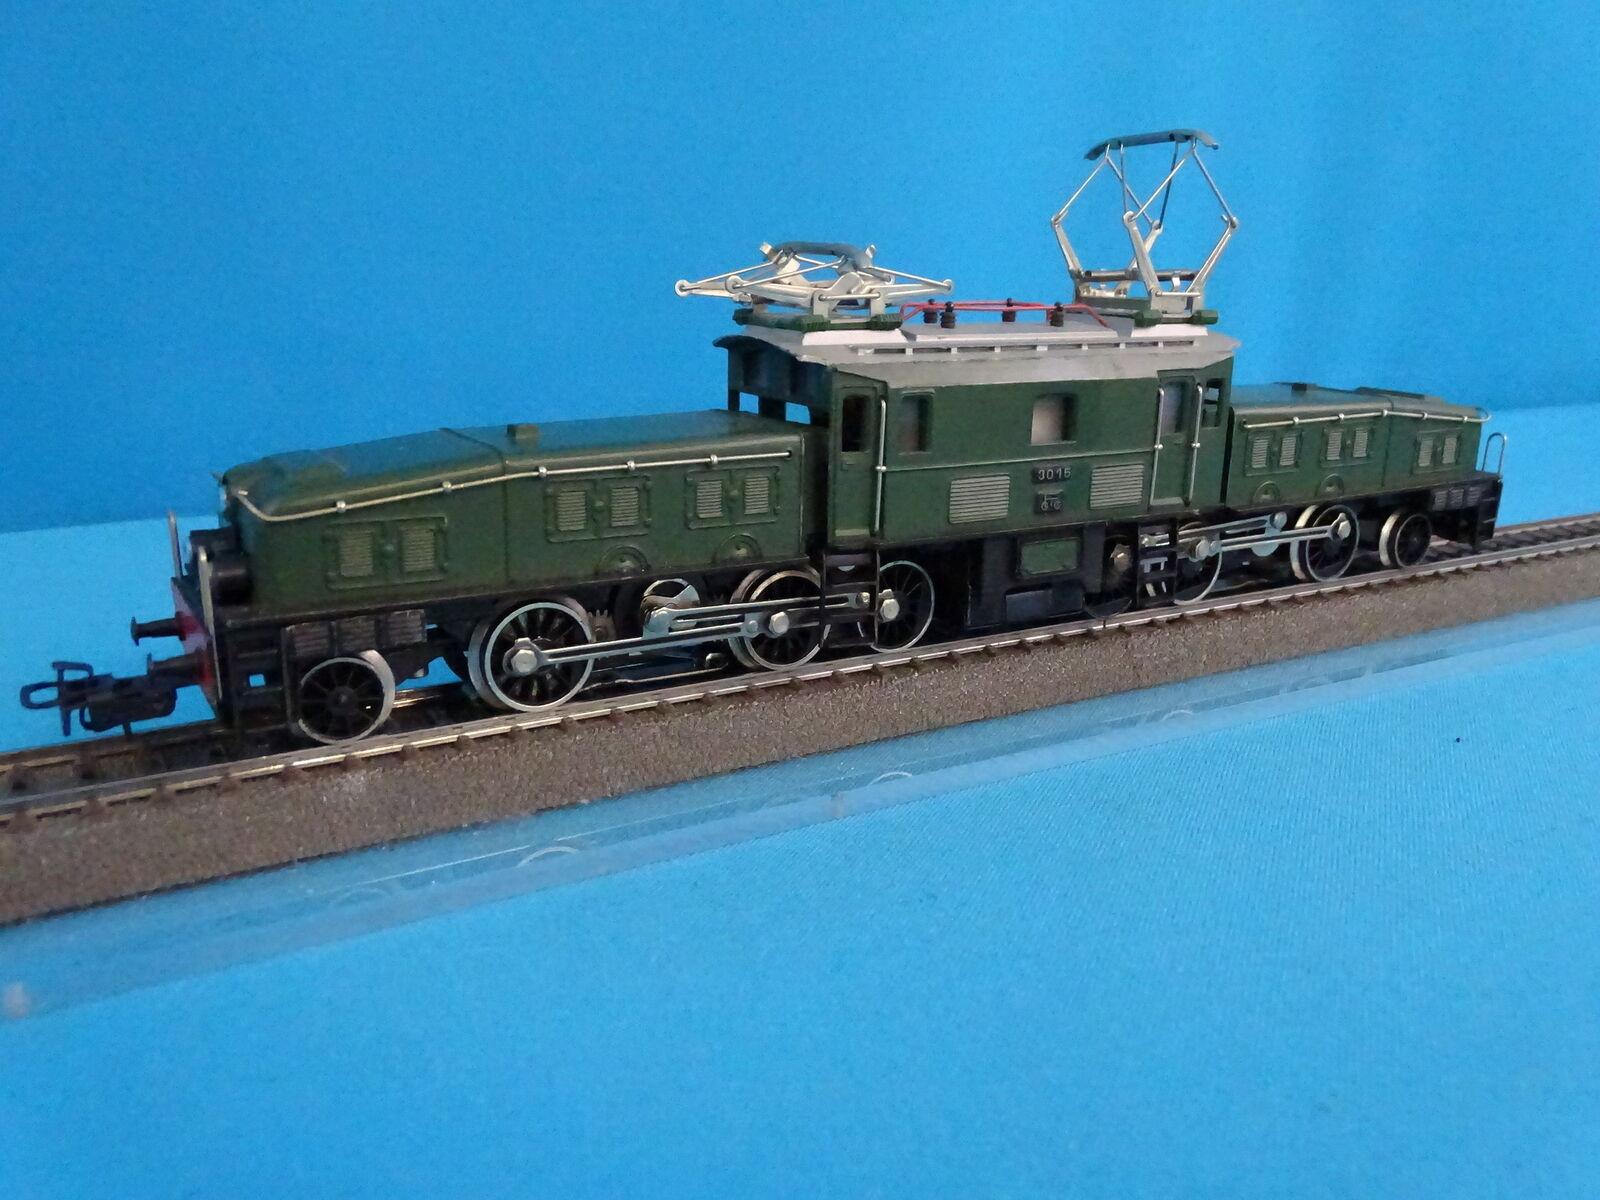 Marklin 3015 SBB CFF Electric Locomotive Br CE 6 8 Krokodil verde AS NEW